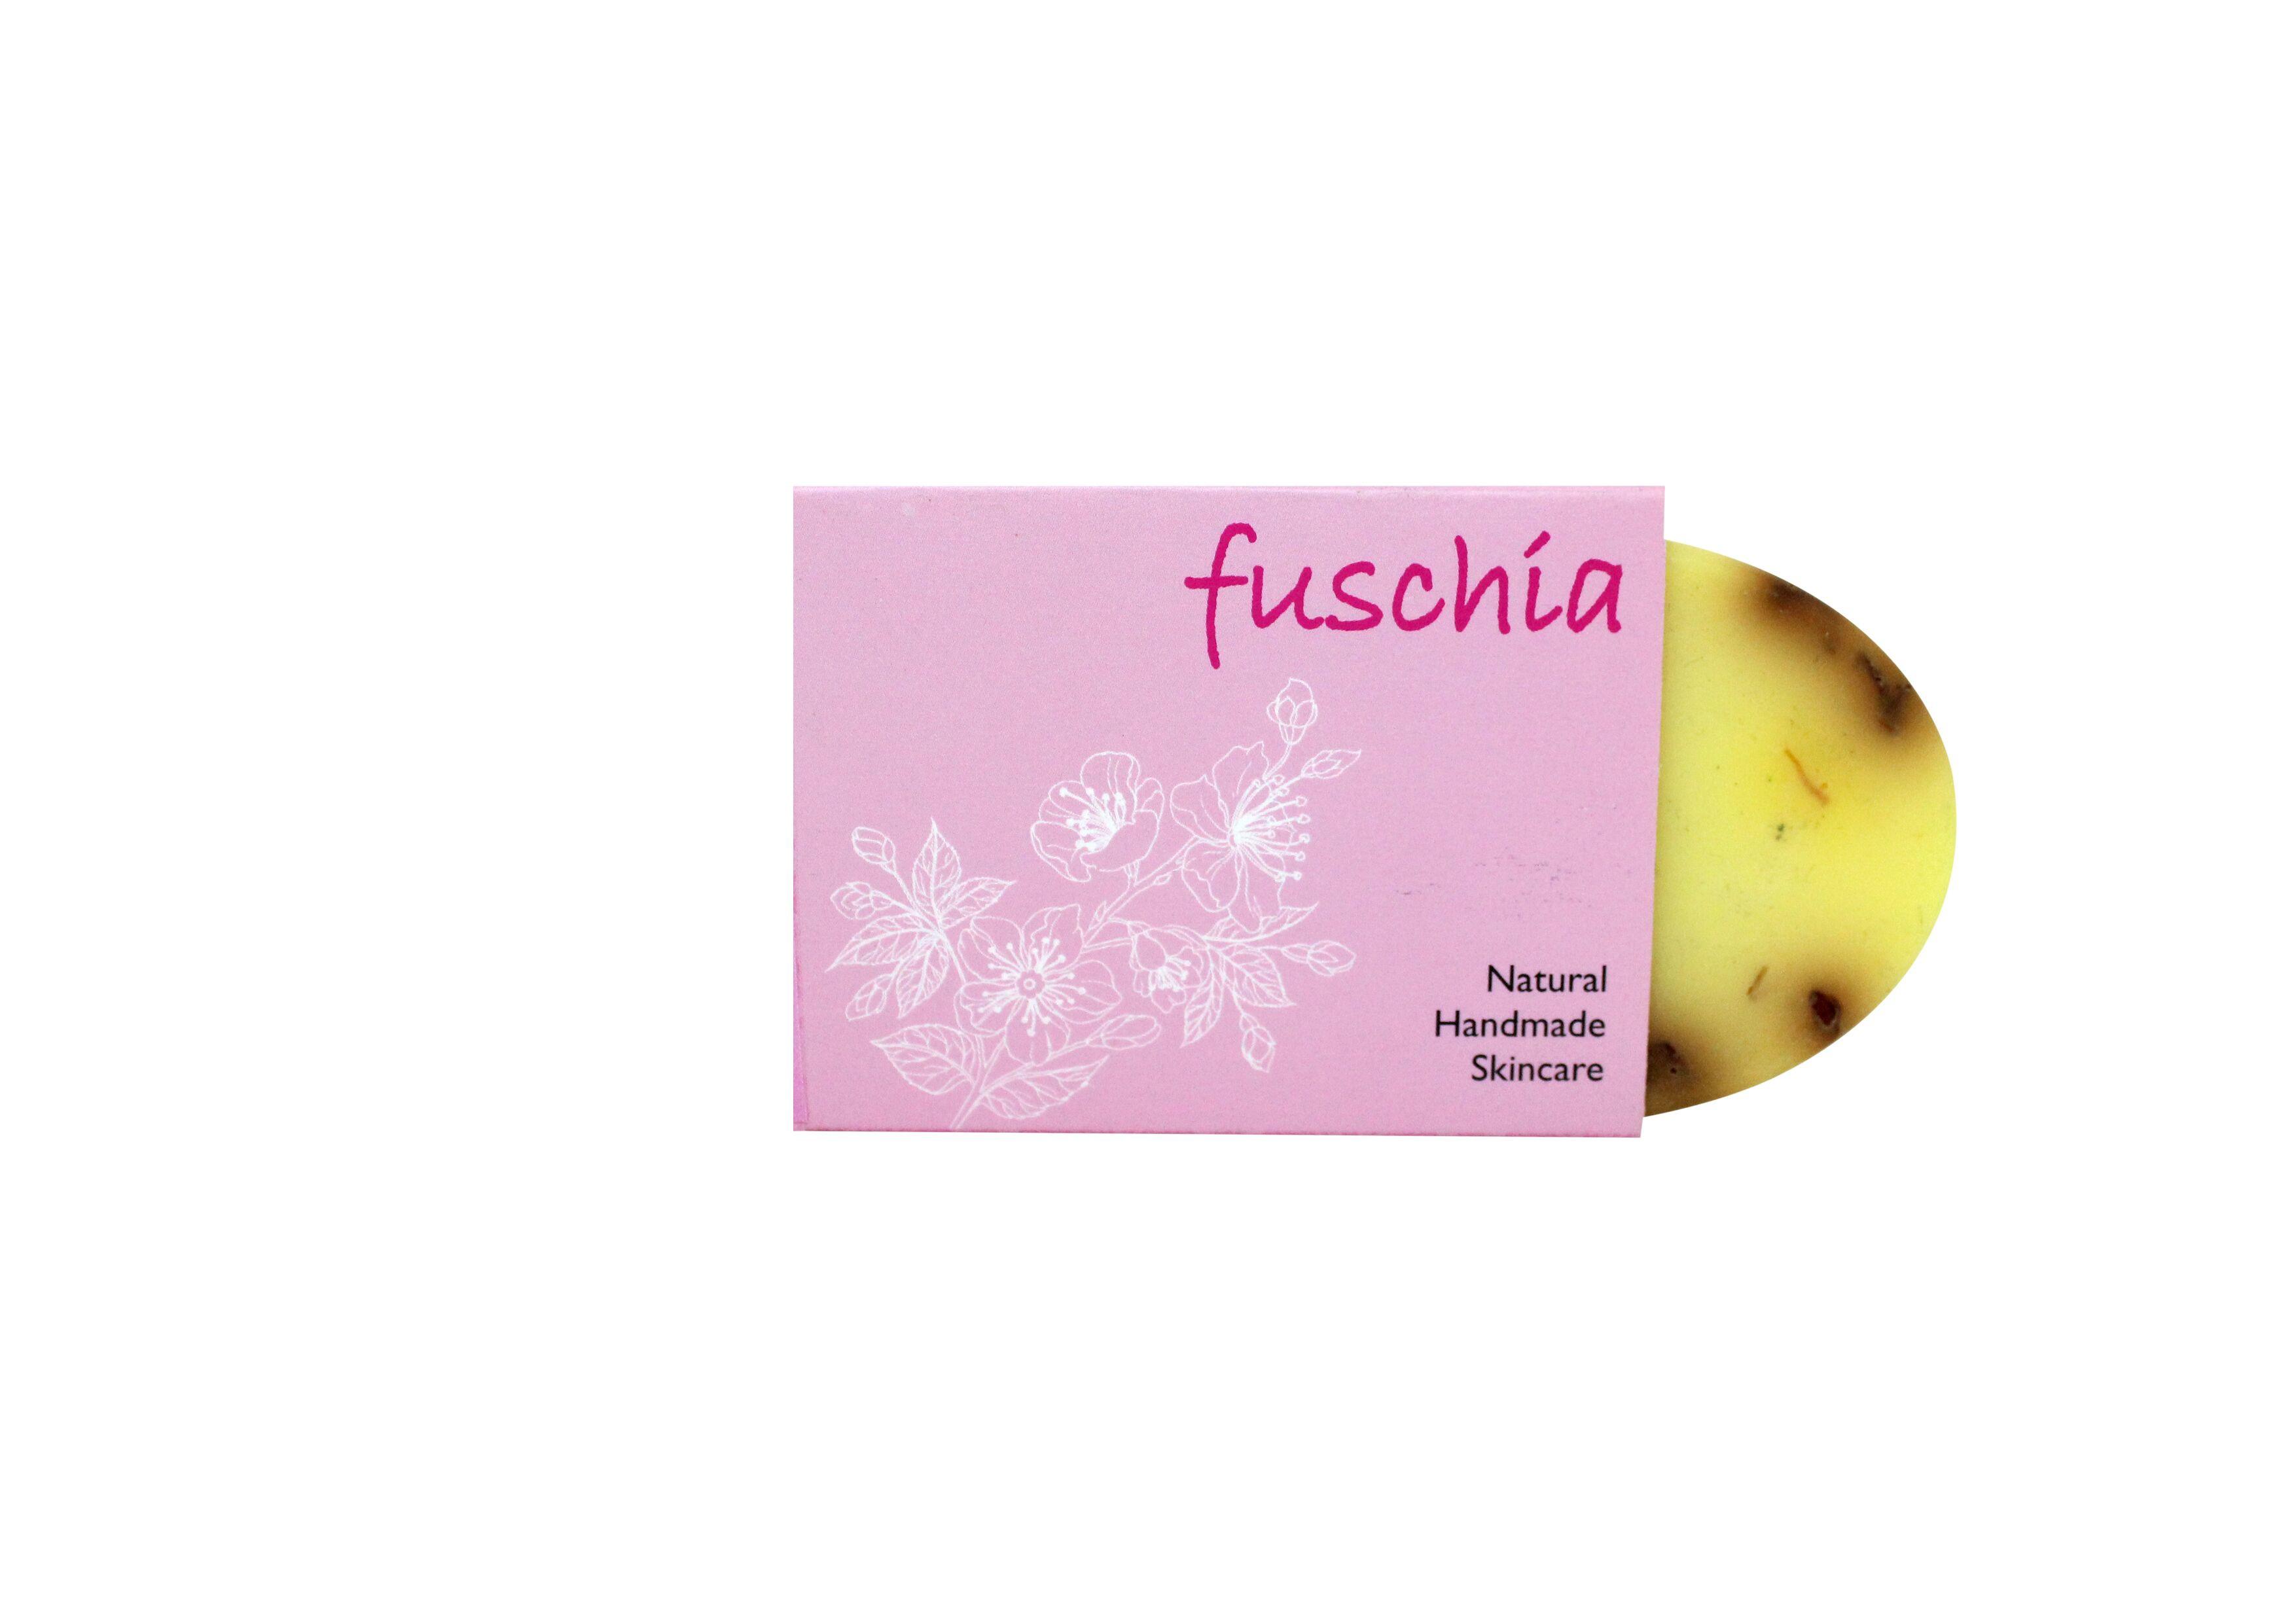 Fuschia - Papaya Detan Natural Handmade Herbal Soap 100gm